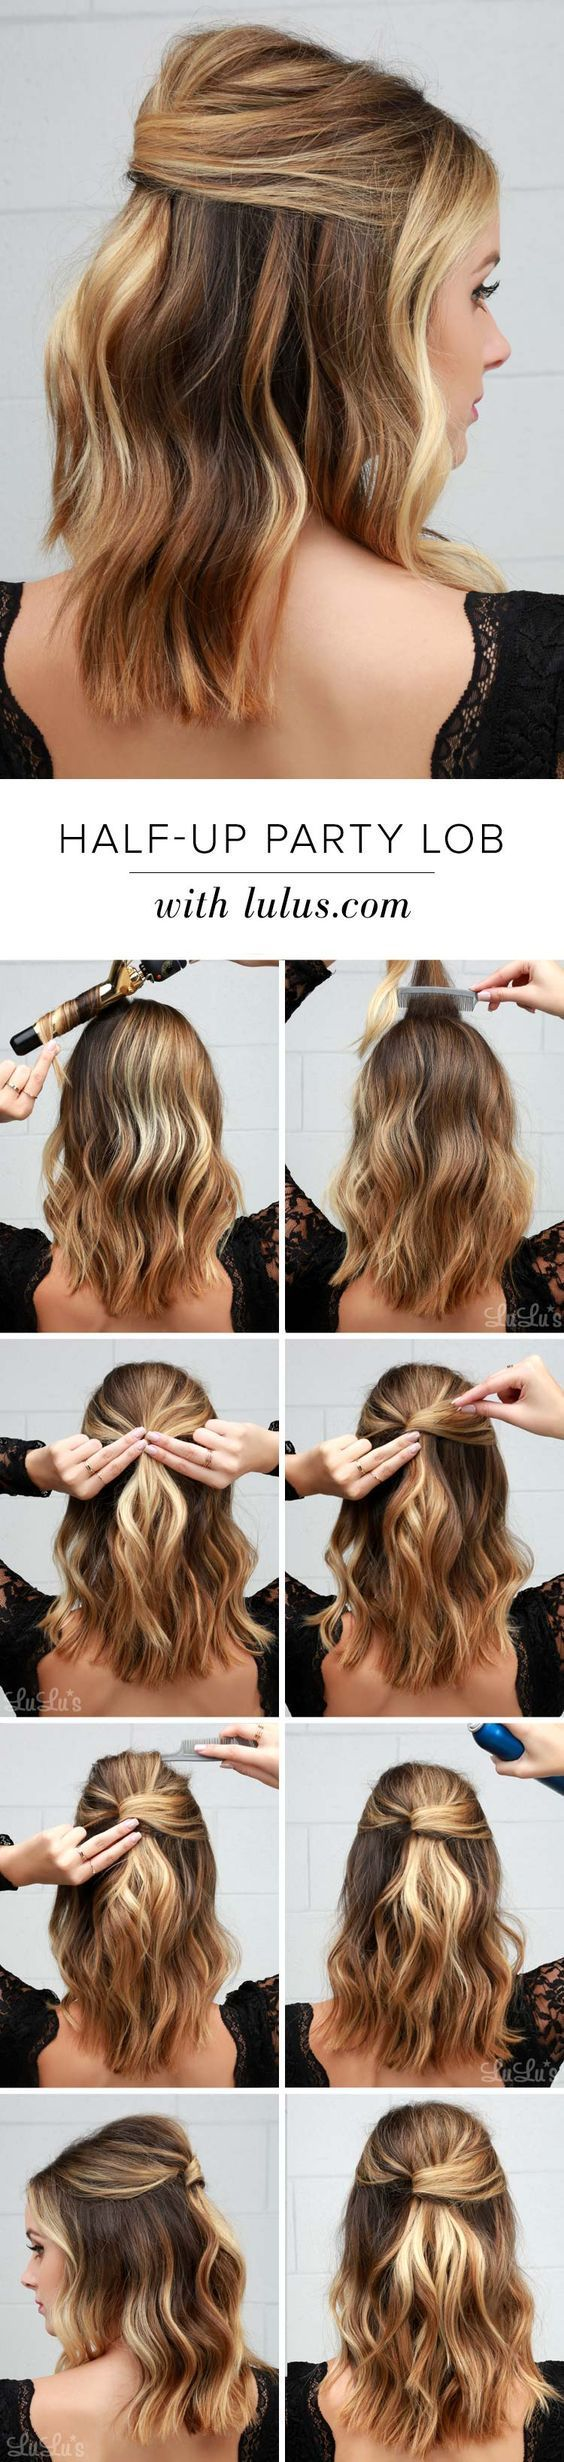 Easy half up half down hairstyles halfup party lob